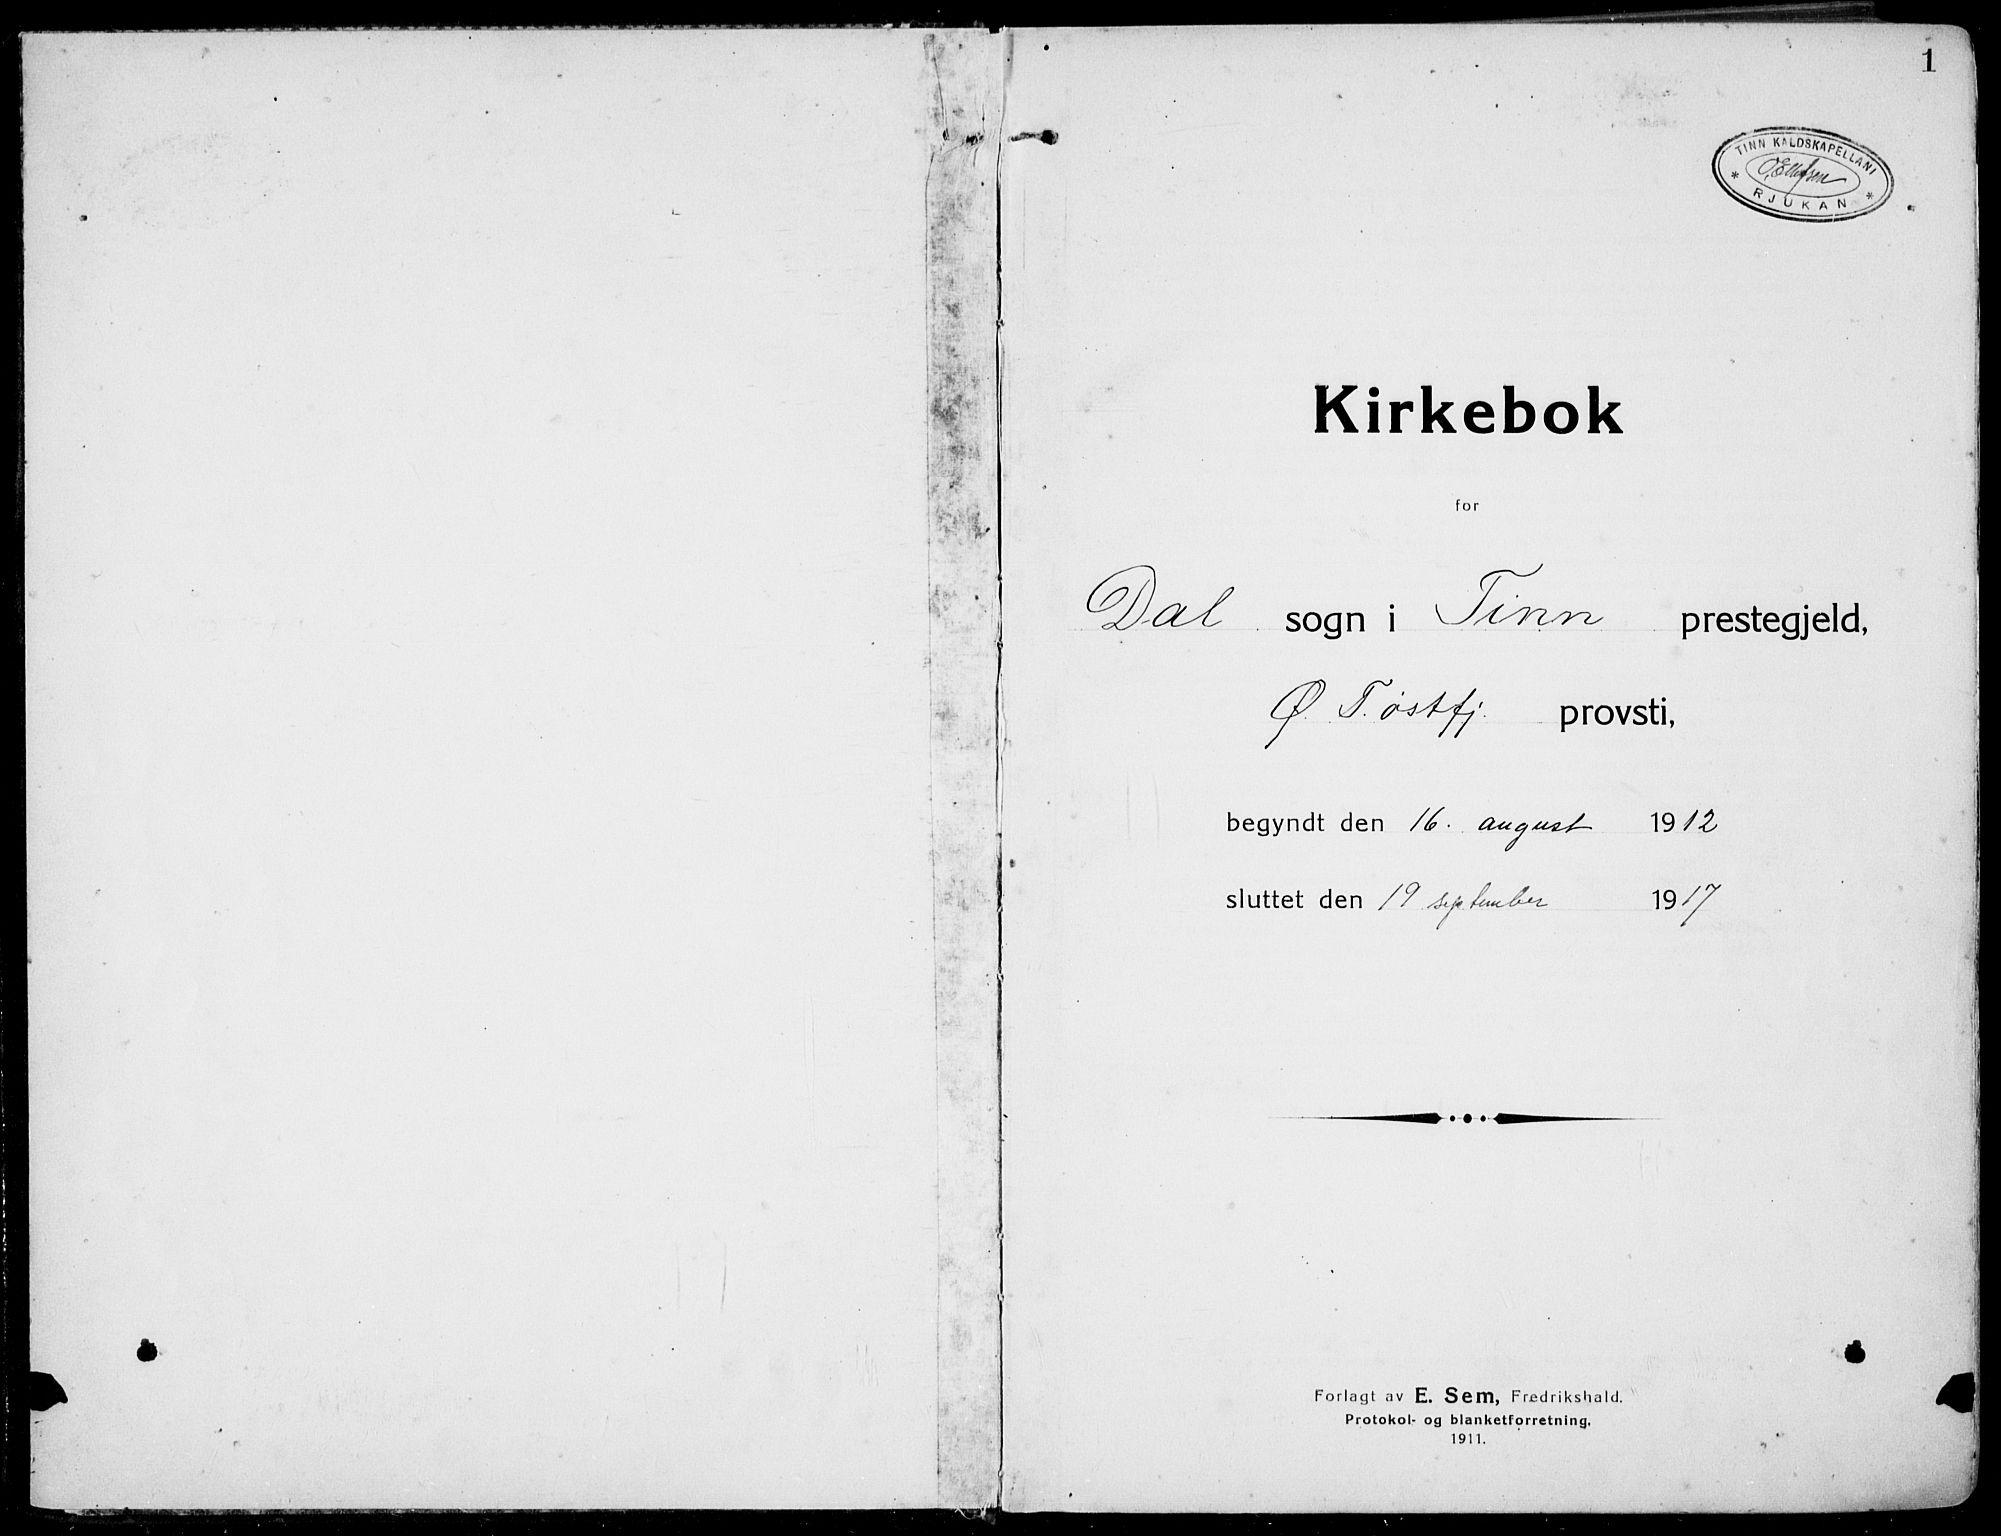 SAKO, Rjukan kirkebøker, F/Fa/L0002: Ministerialbok nr. 2, 1912-1917, s. 1